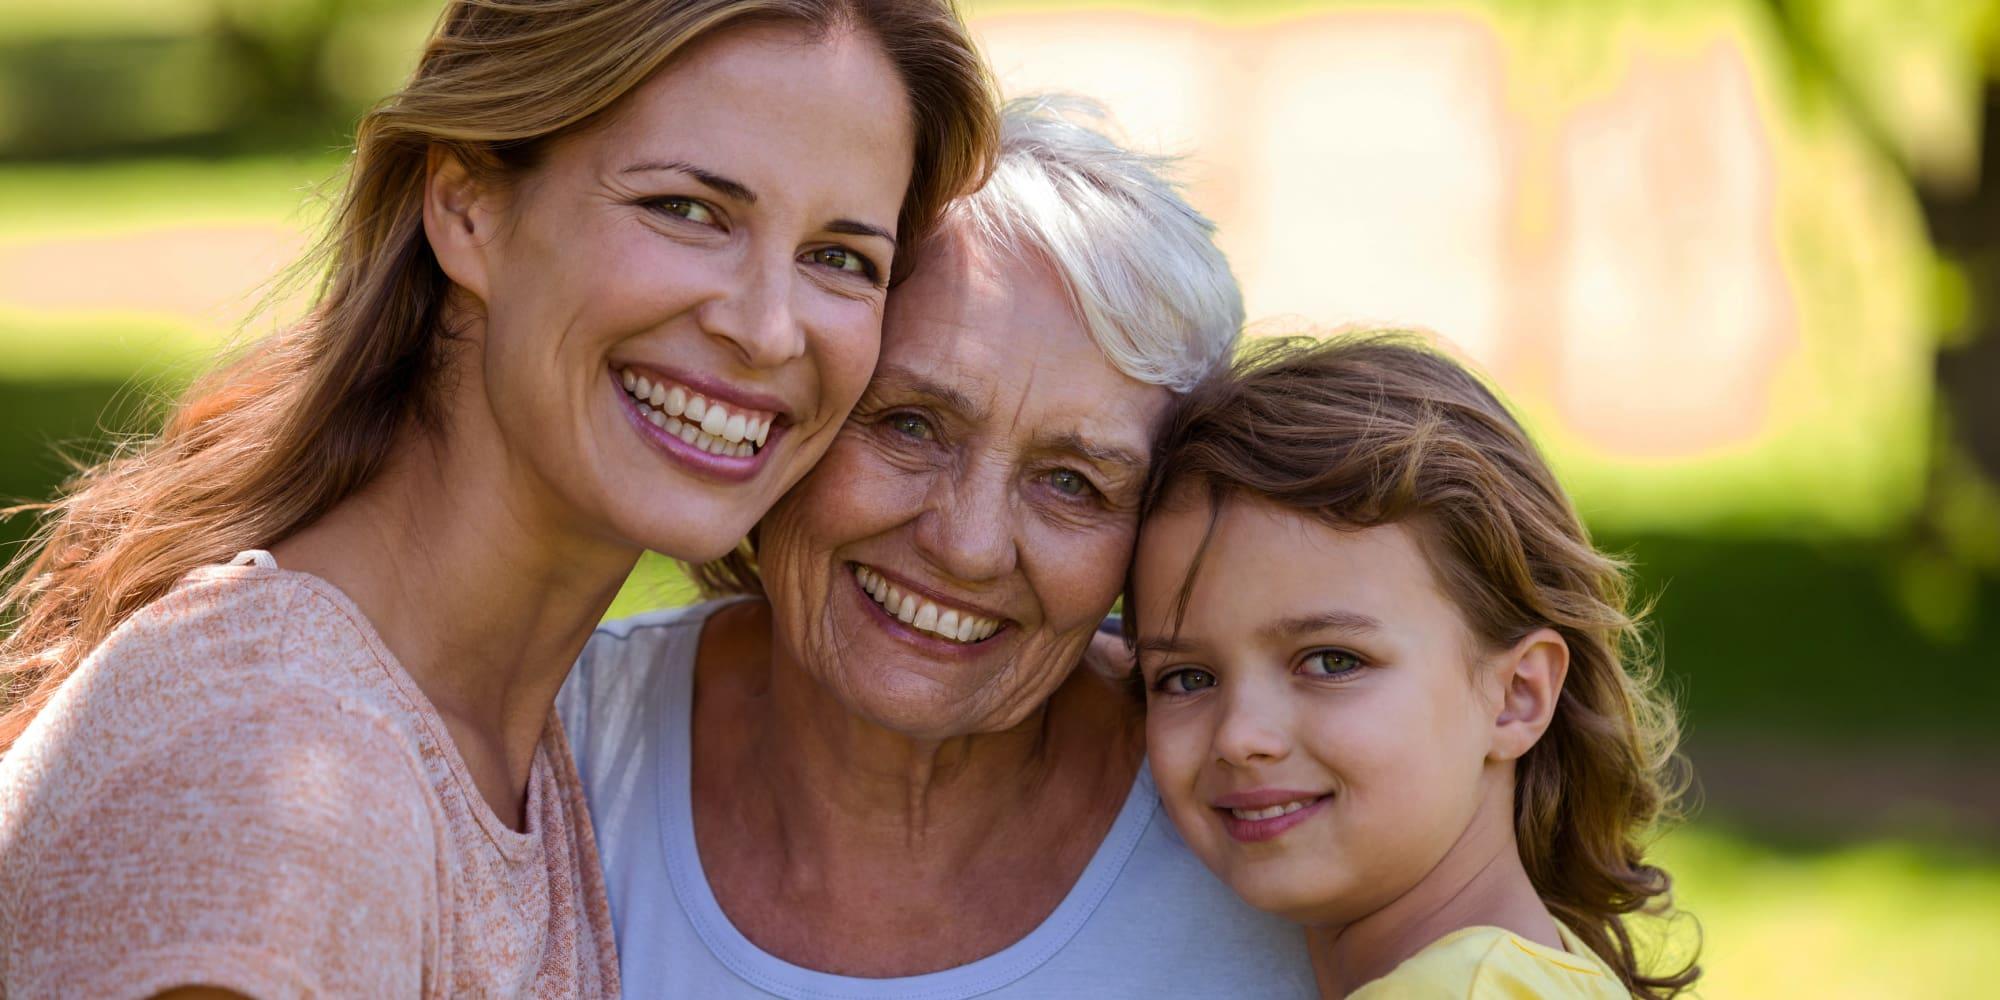 A resident and her family at Avenir Senior Living in Scottsdale, Arizona.